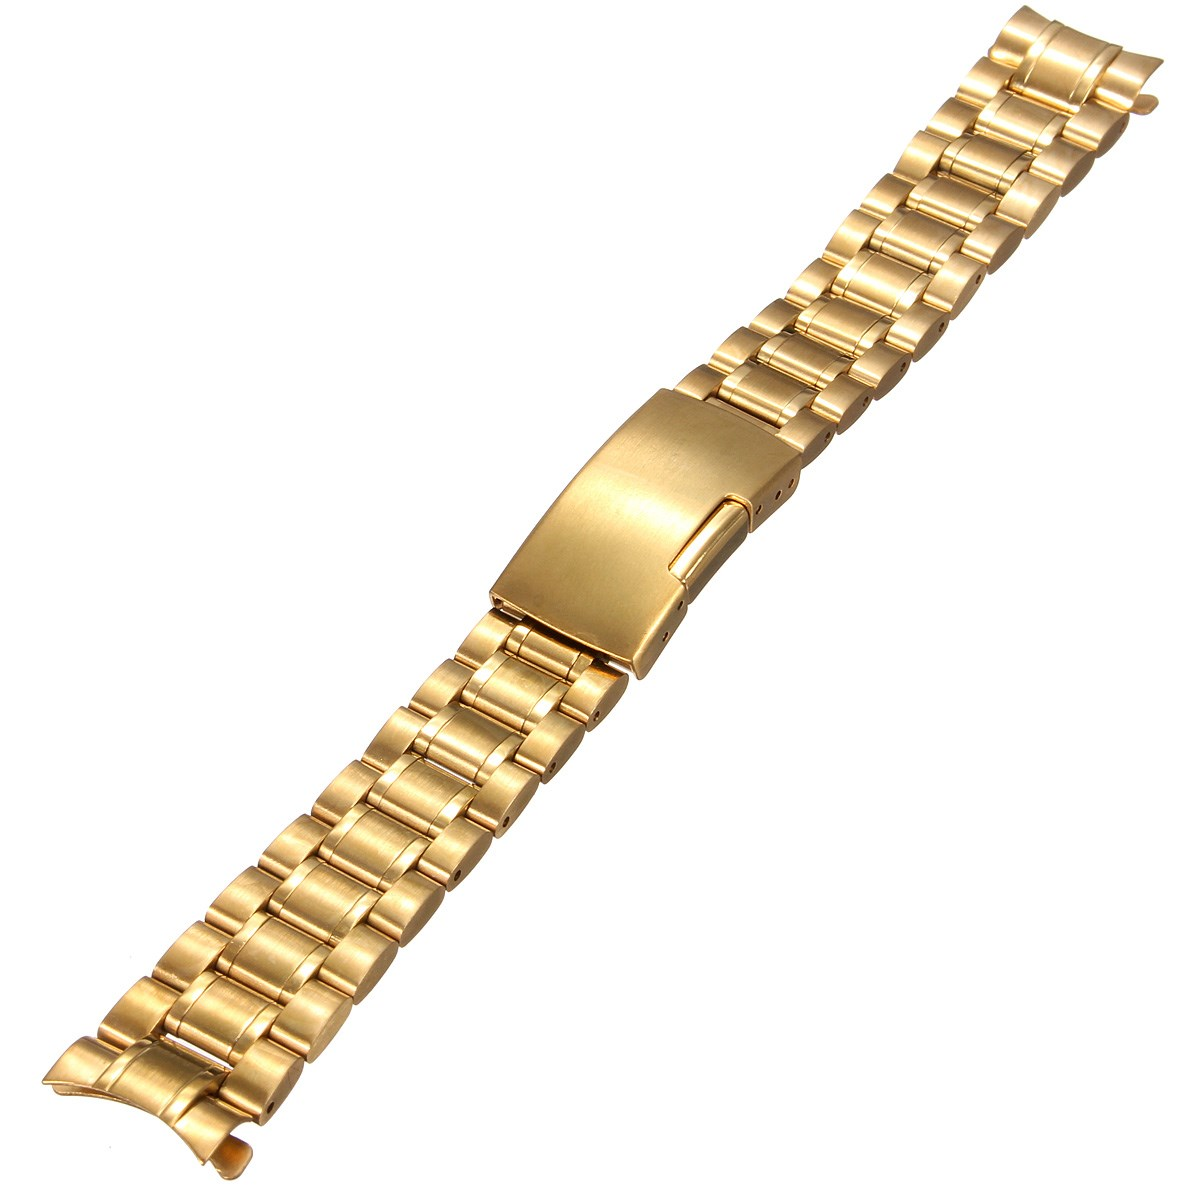 Hot 20mm Solid Stainless Steel Watch Bands Curved End Watches Strap Gold Watchband Bracelet Belt For Man Woman Wristband 20mm 23mm curved end watchbands rubber wrap rose gold stainless steel watch strap solid link bracelet for ar5890 5905 5919 5858